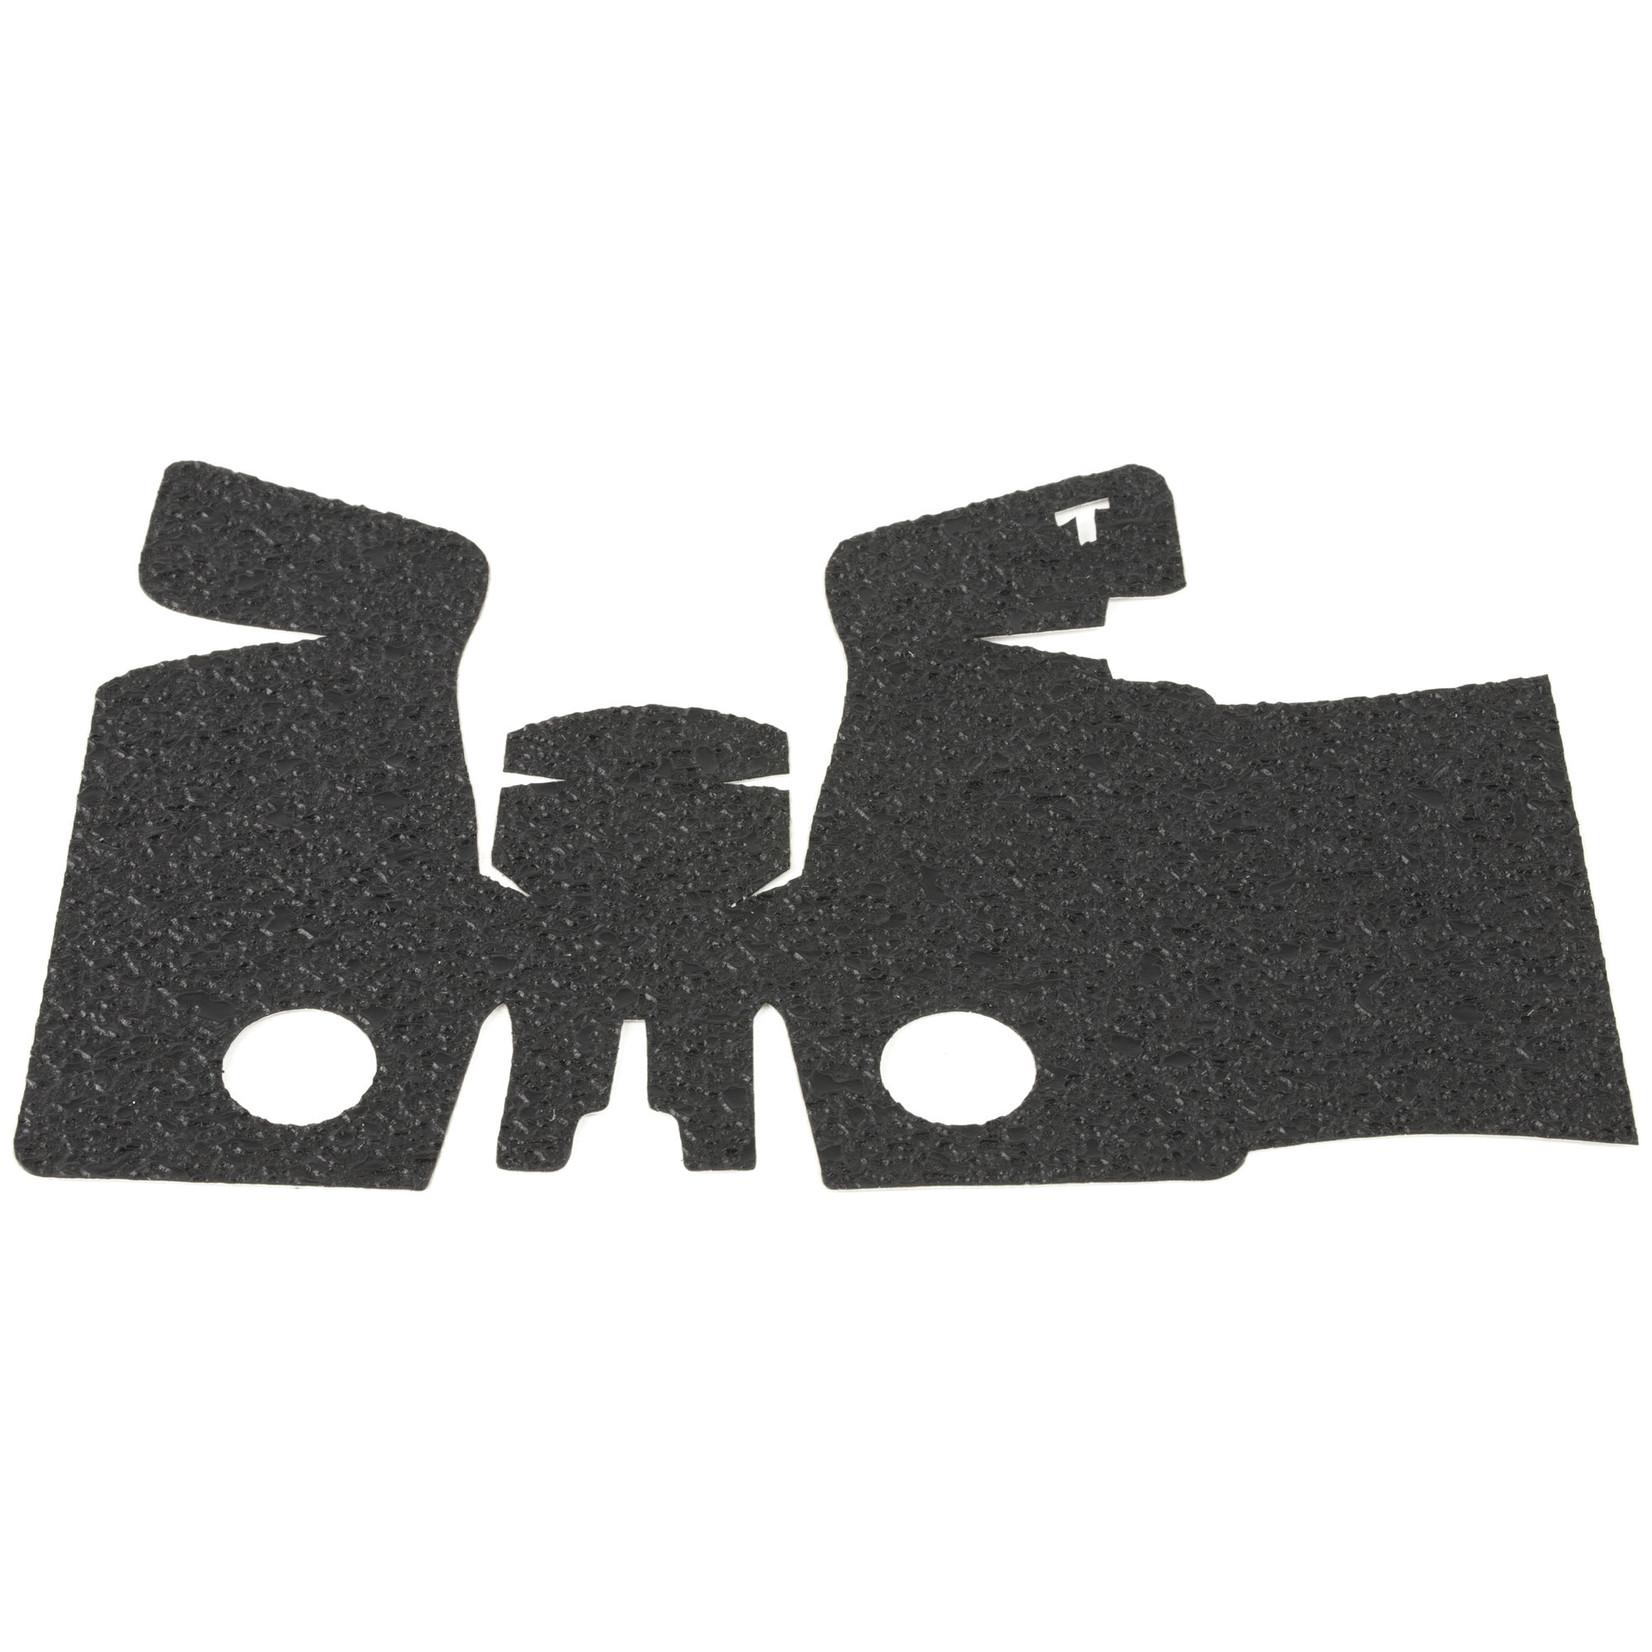 TALON Grips Inc TALON Grips Inc, Rubber, Grip, Black, Adhesive Grip, S&W SD9/SD40/SD9 VE/SD40 VE